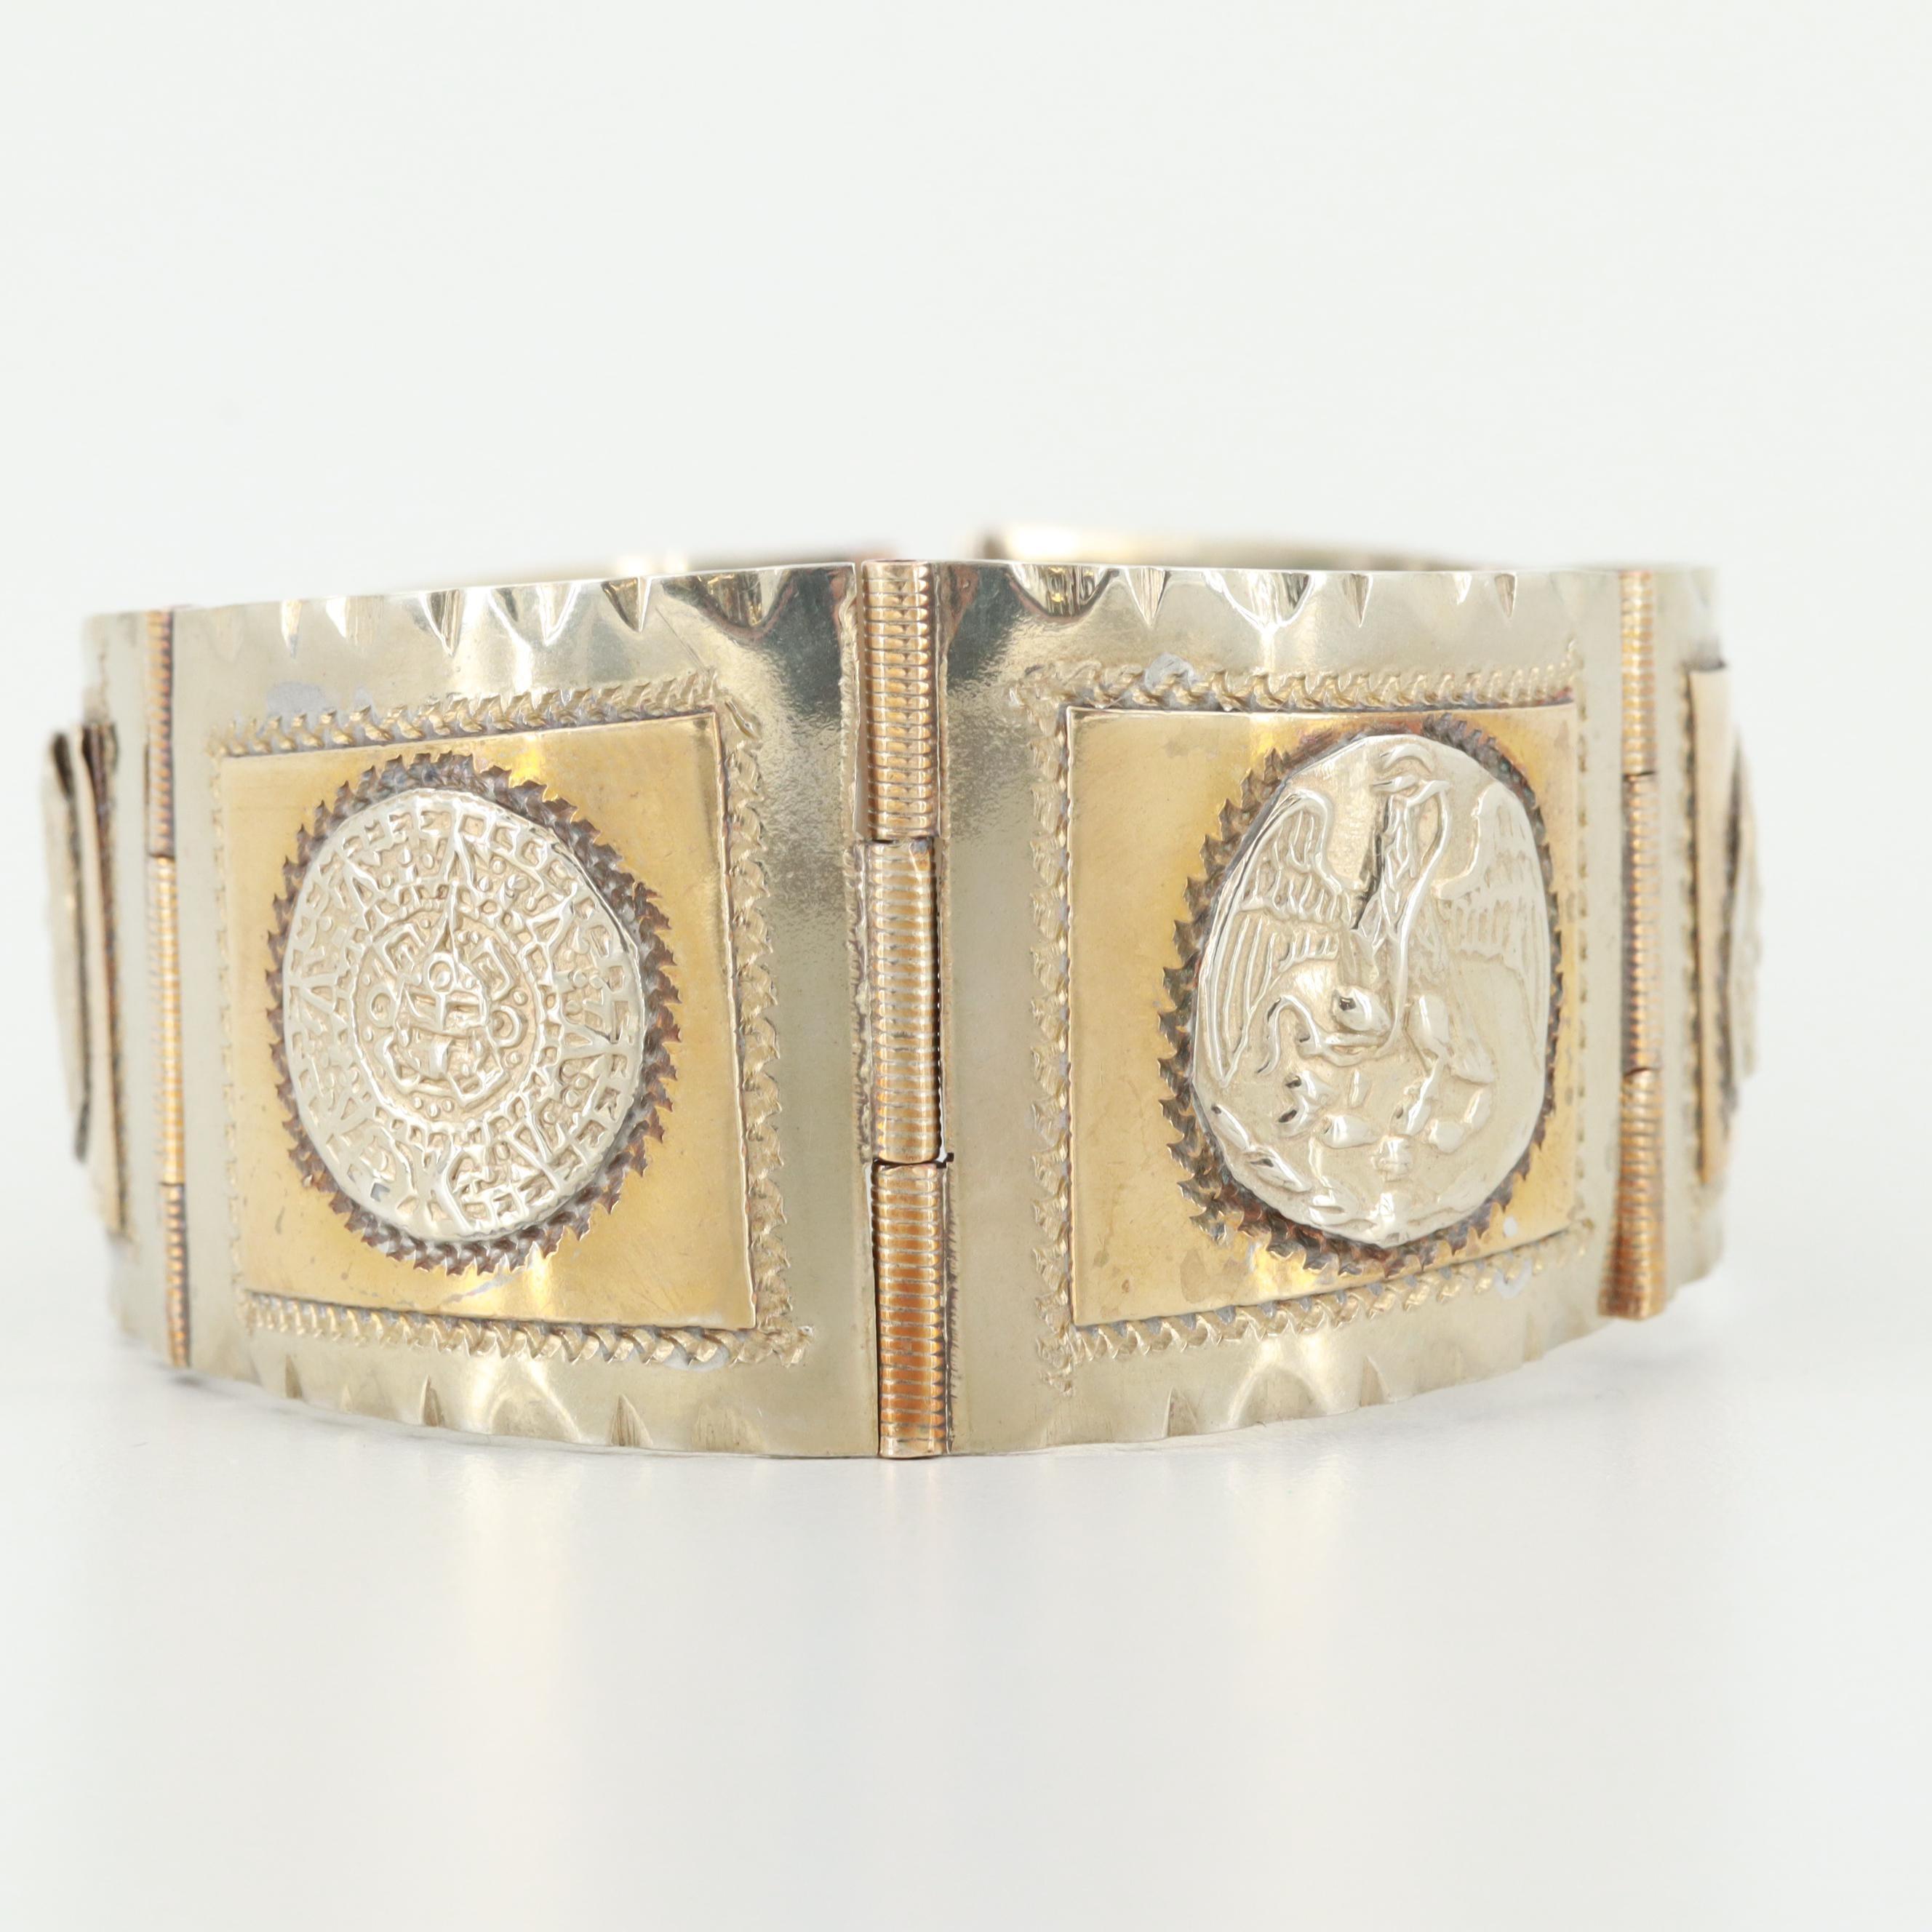 Taxco Sterling Silver Aztec Themed Paneled Bracelet